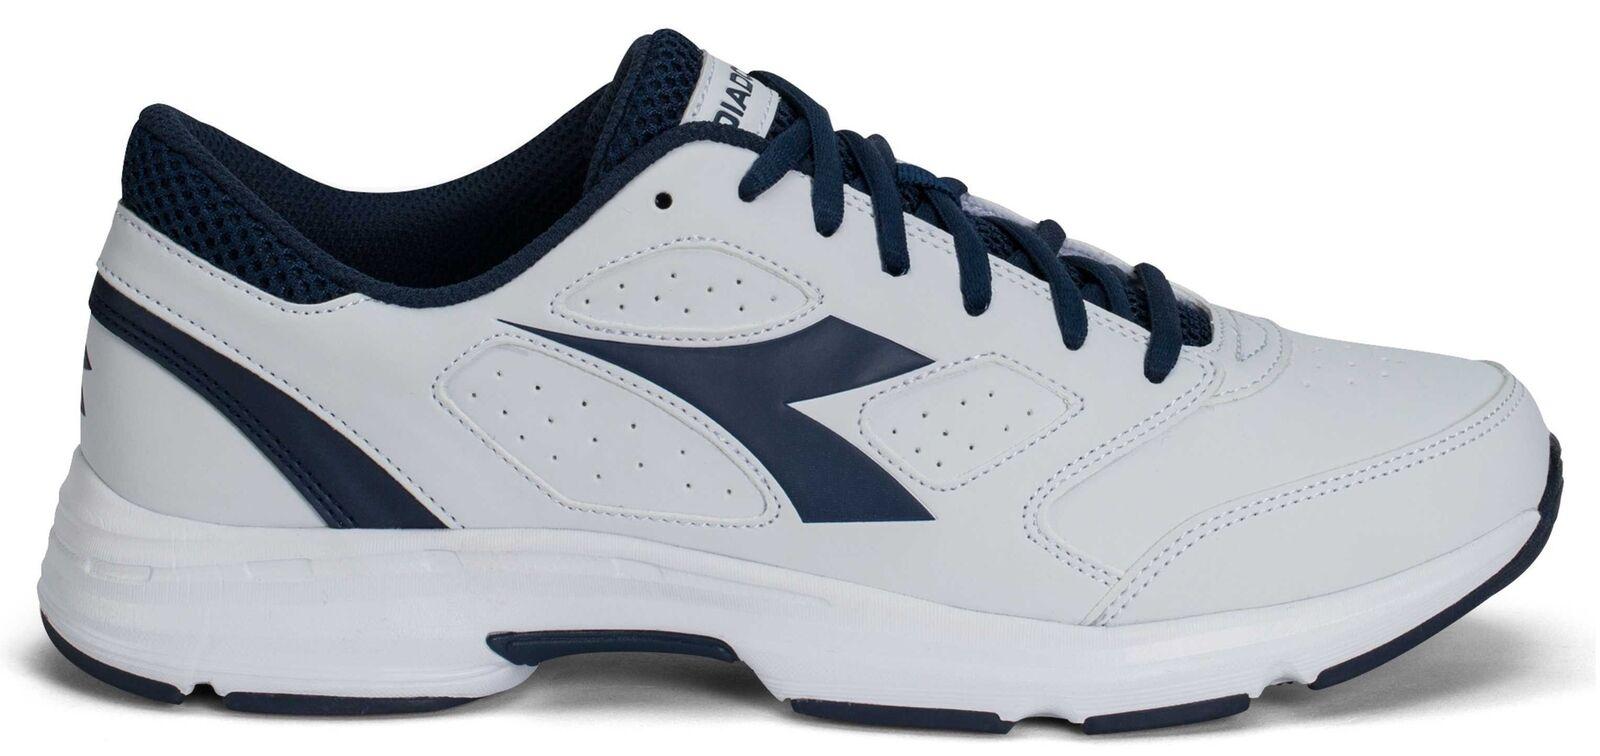 Diadora Scarpa  Running Sneaker Jogging men Shape 7 sl White saltire navy shoes  wholesale cheap